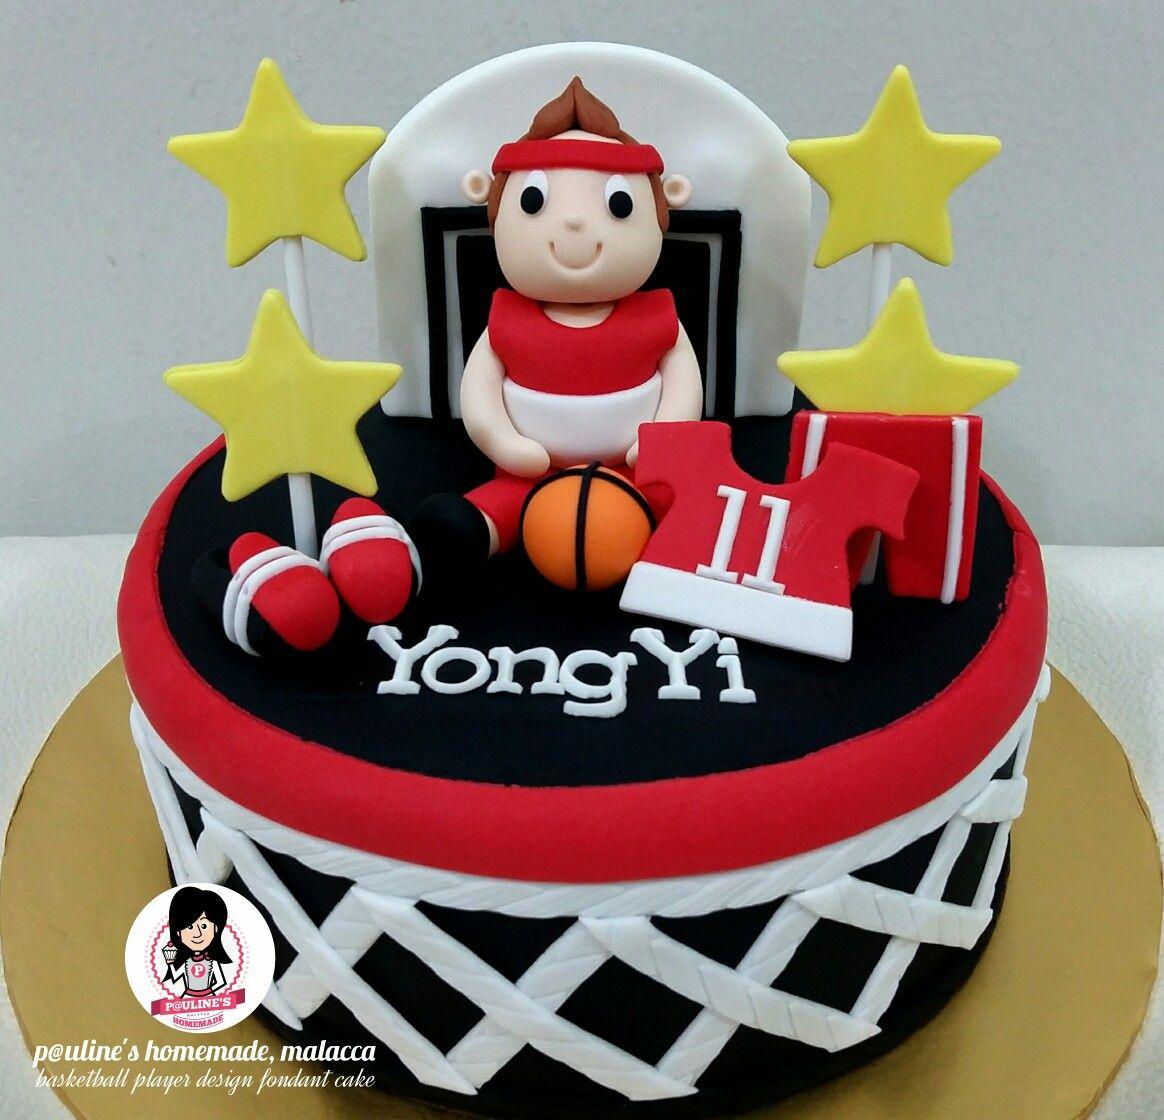 Basketball Player Design Fondant Cake Fondant Pinterest